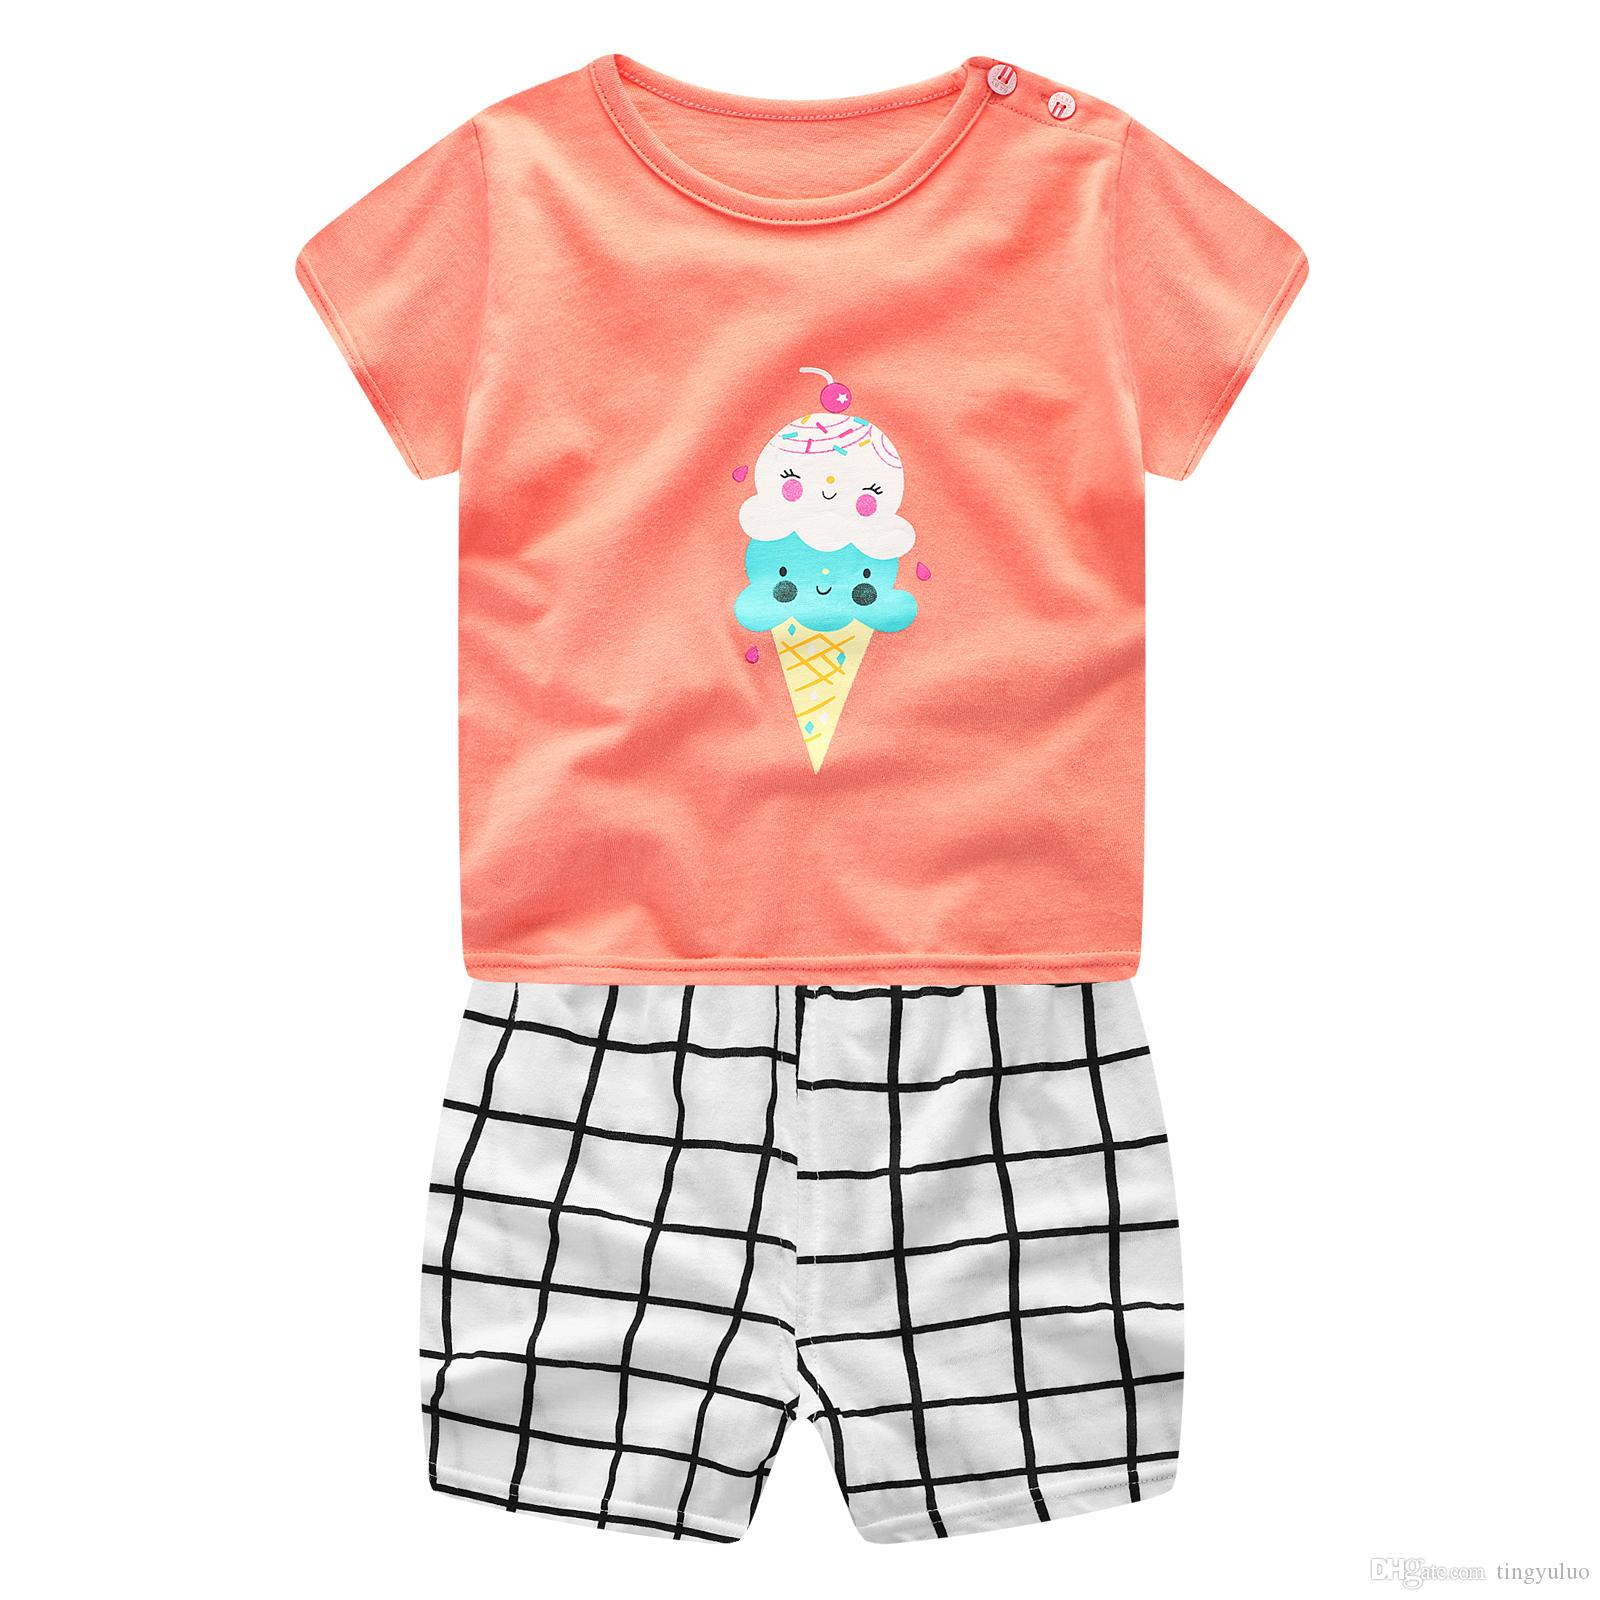 2018 Plaid Baby Boy Clothes Summer 2018 New Born Baby Boy Clothes ...